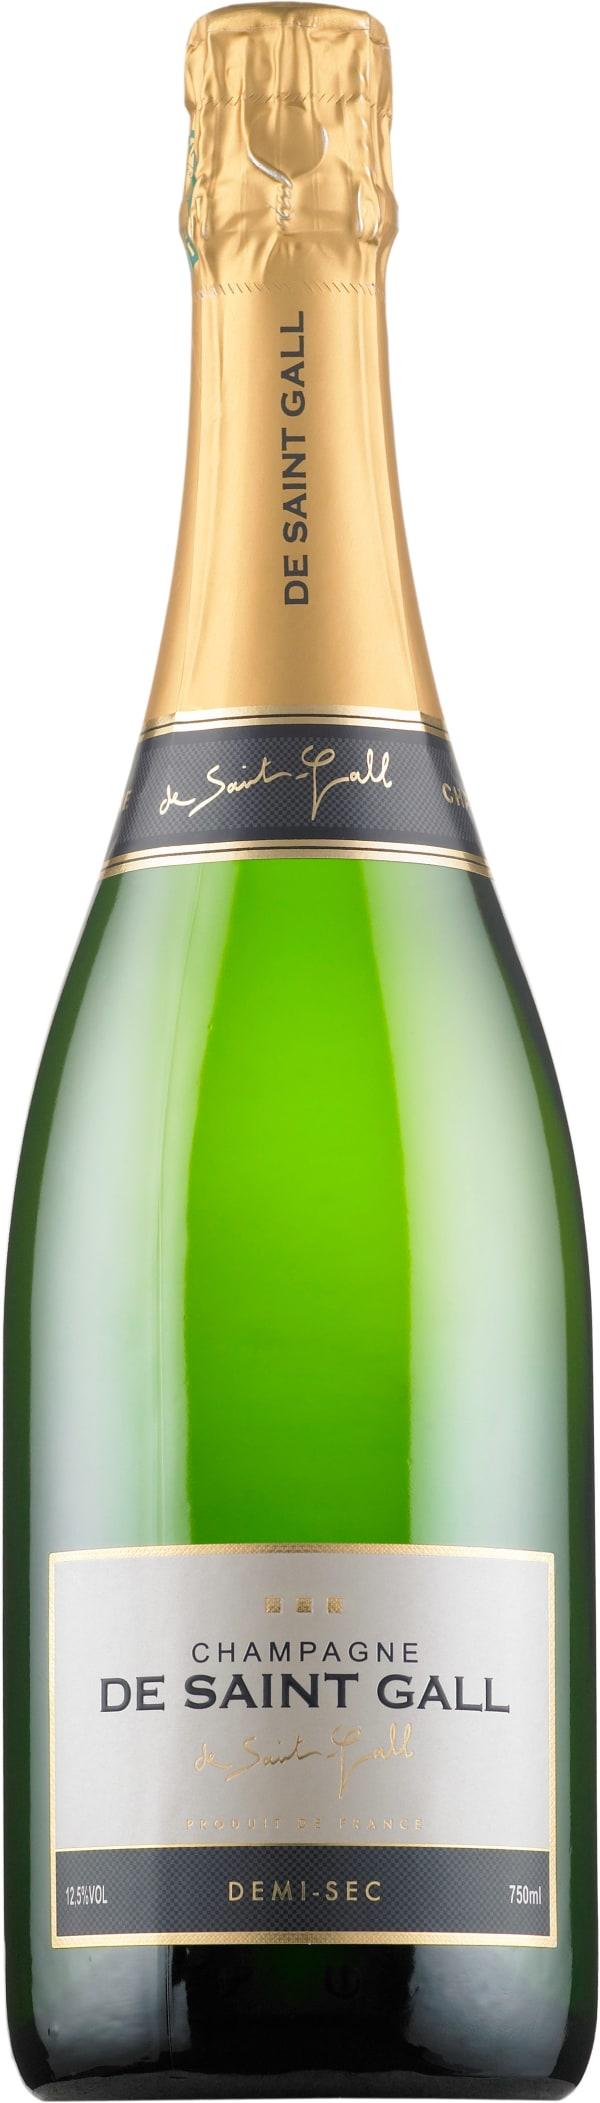 De Saint Gall Champagne Demi-Sec